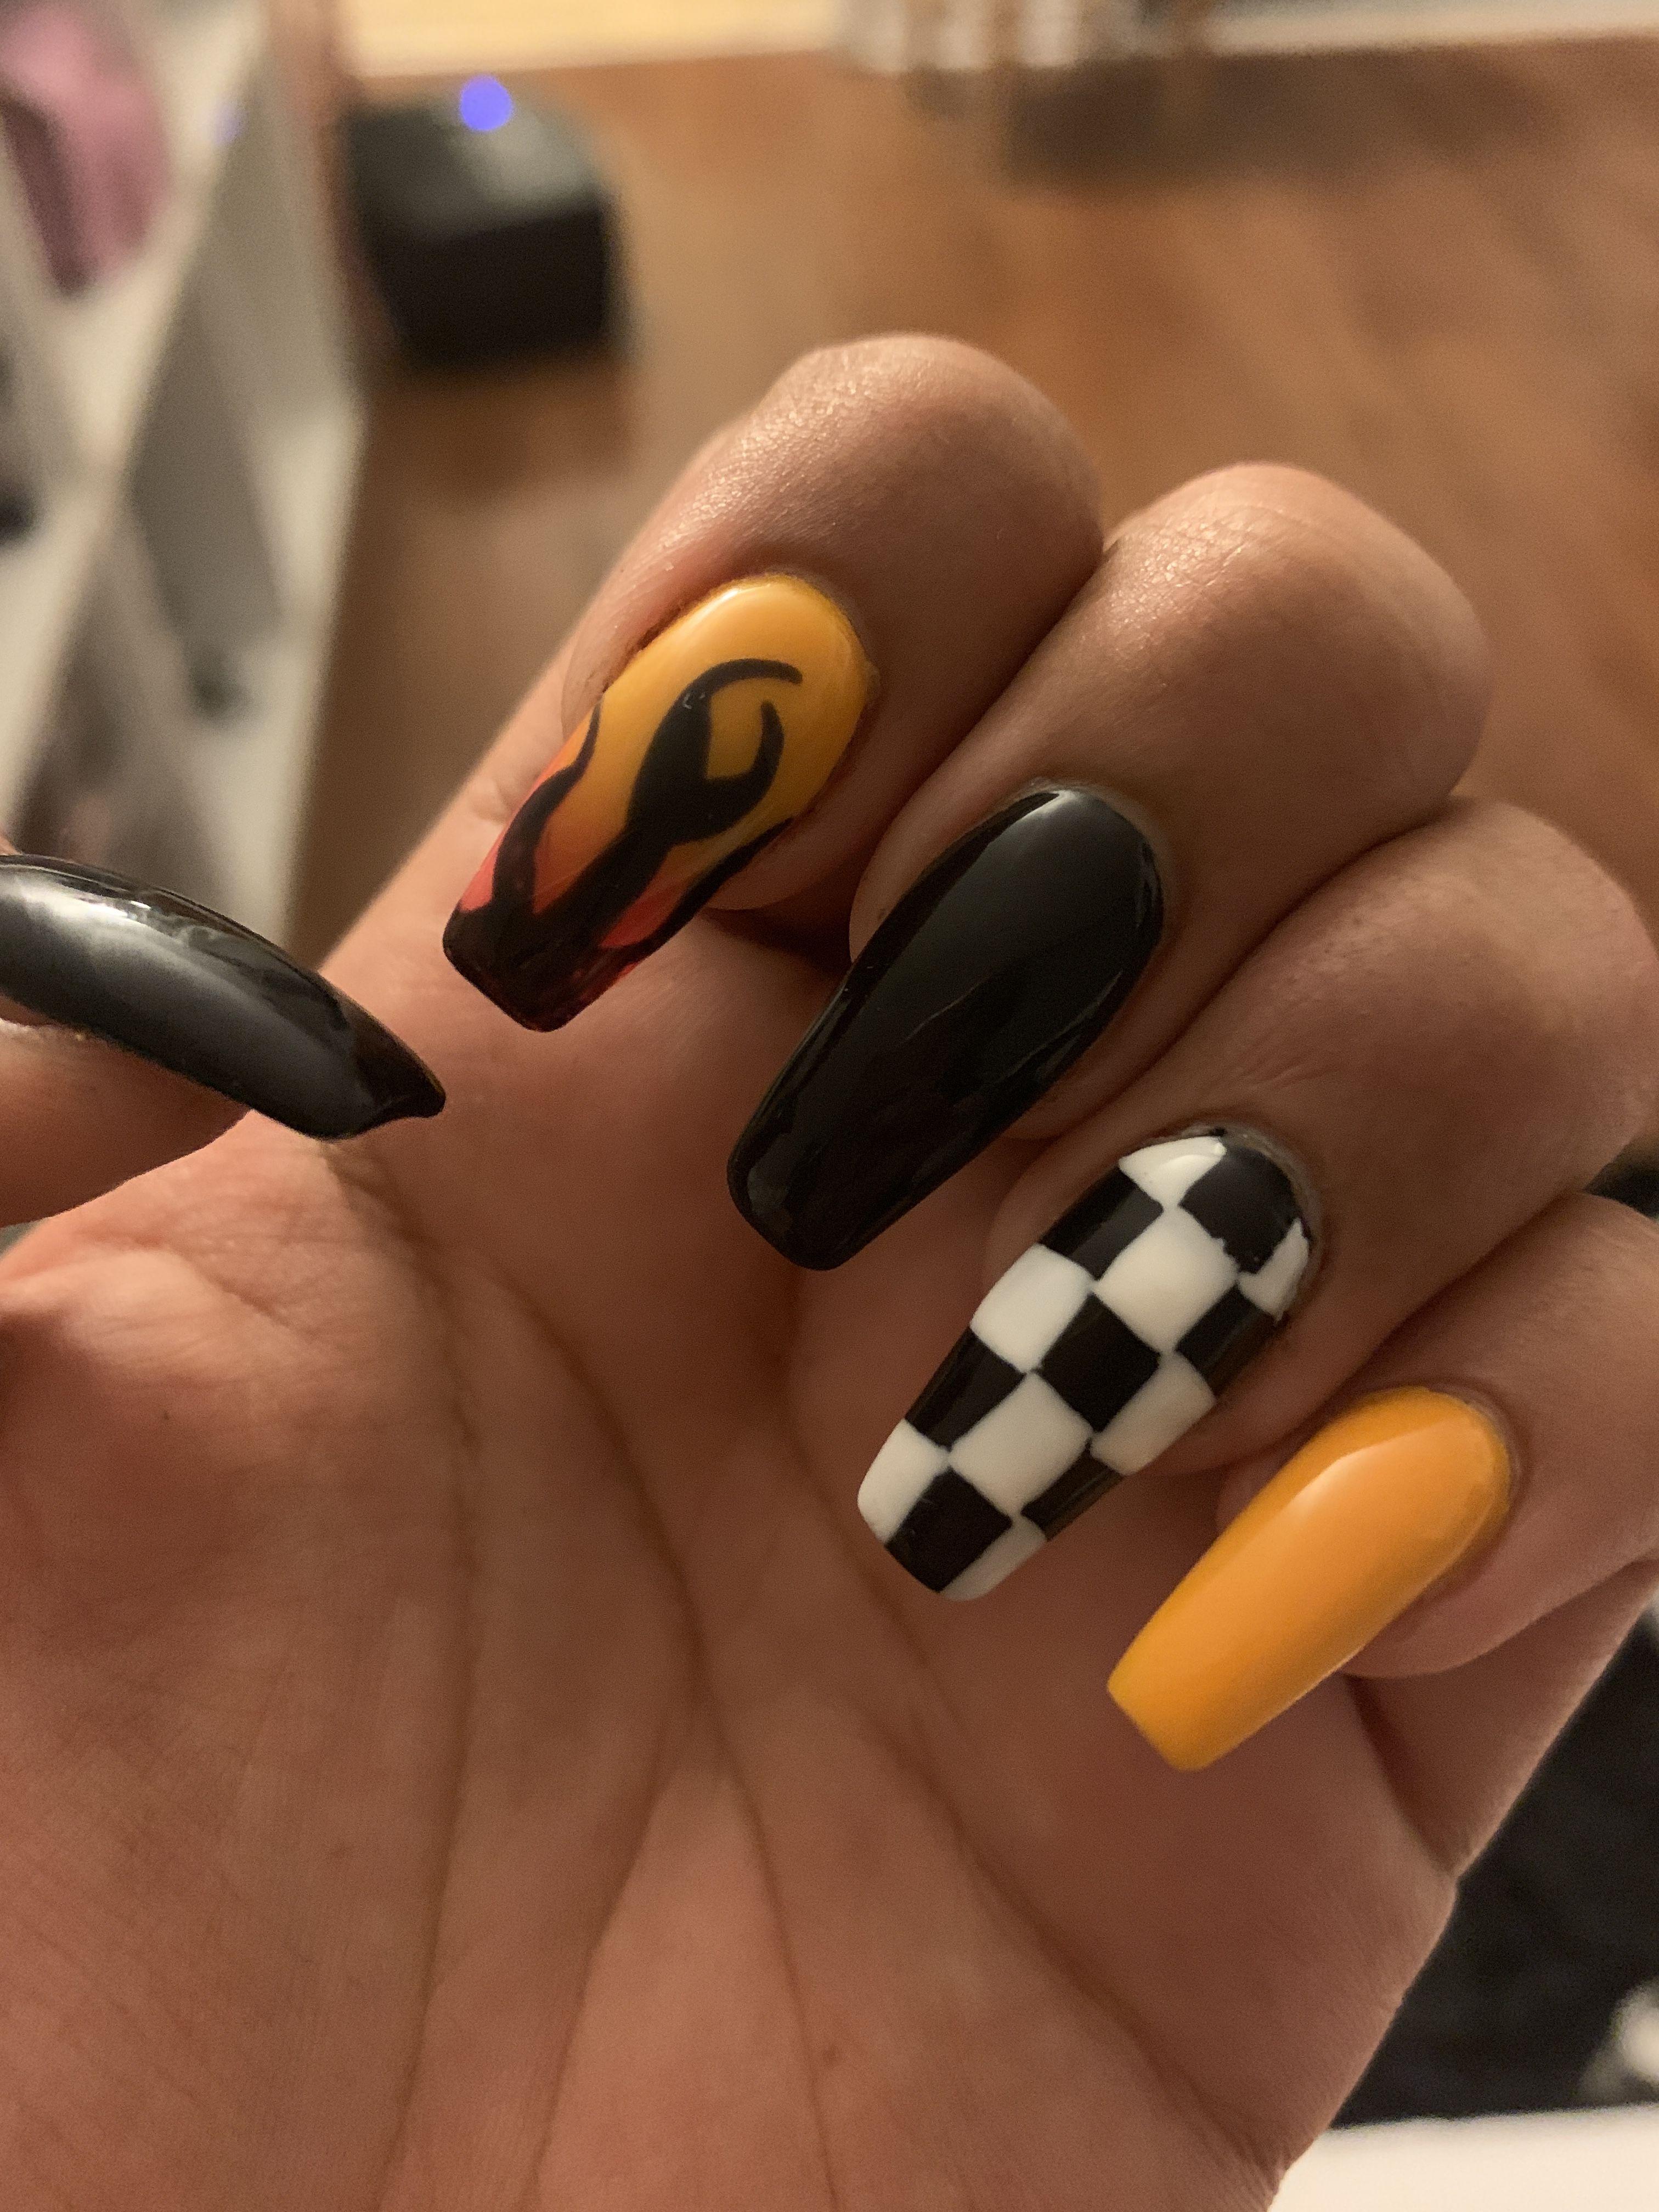 Pin Fabxiety ʖ Checkered Nails Dream Nails Fire Nails